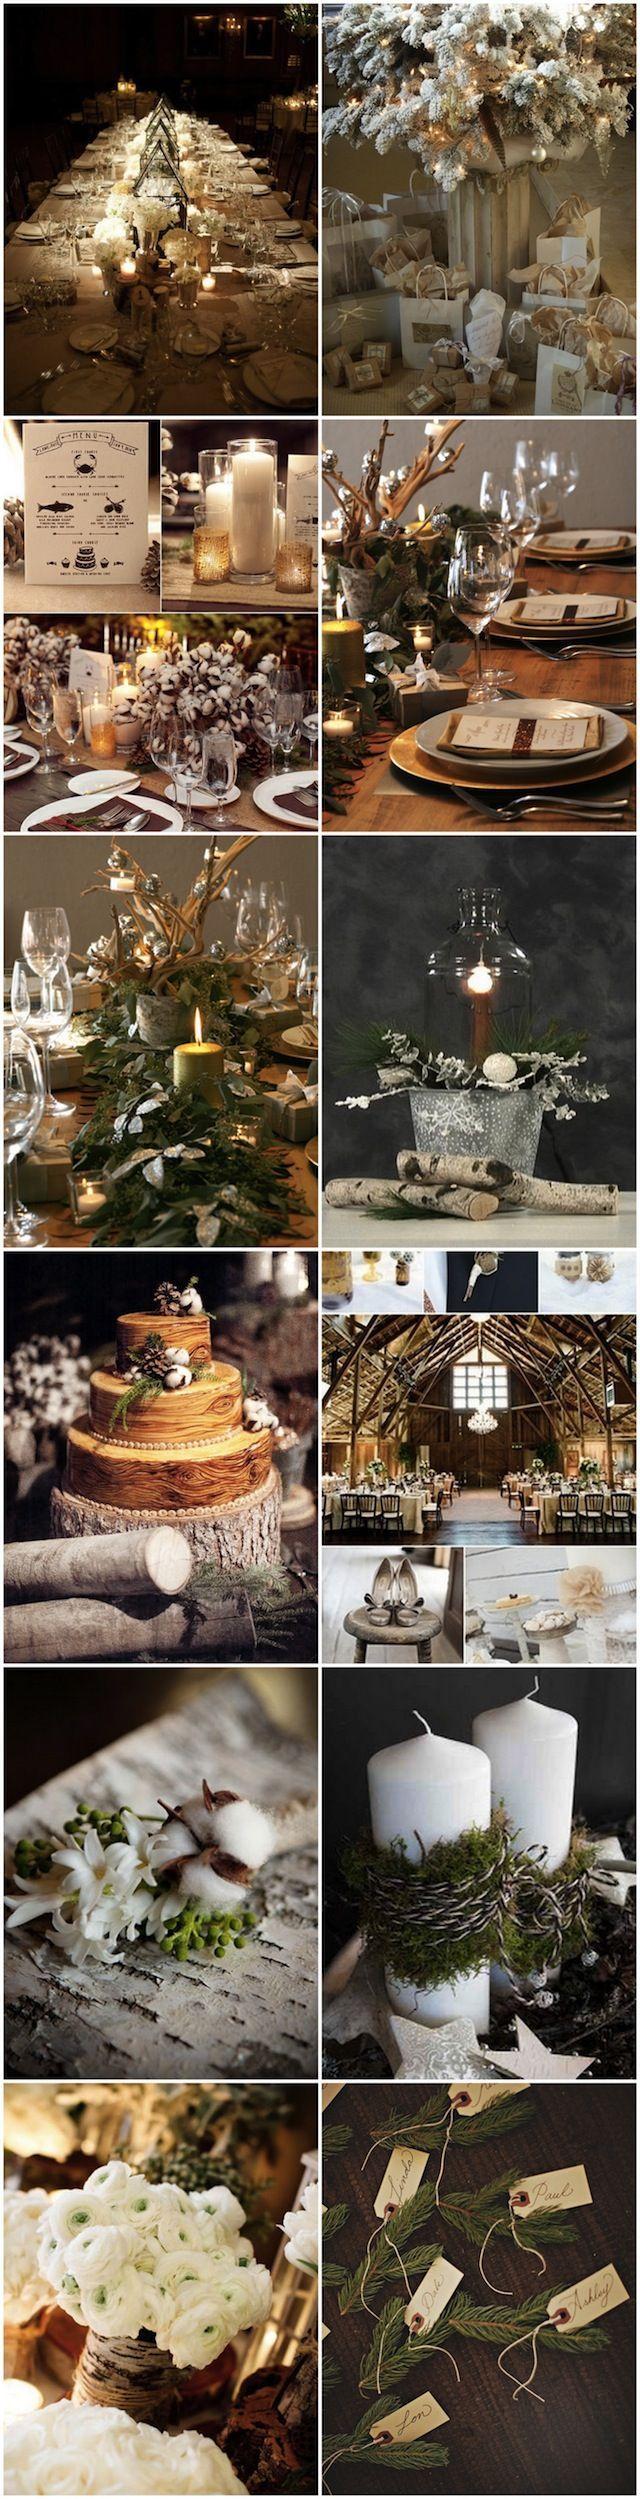 best winter wedding images on pinterest winter weddings